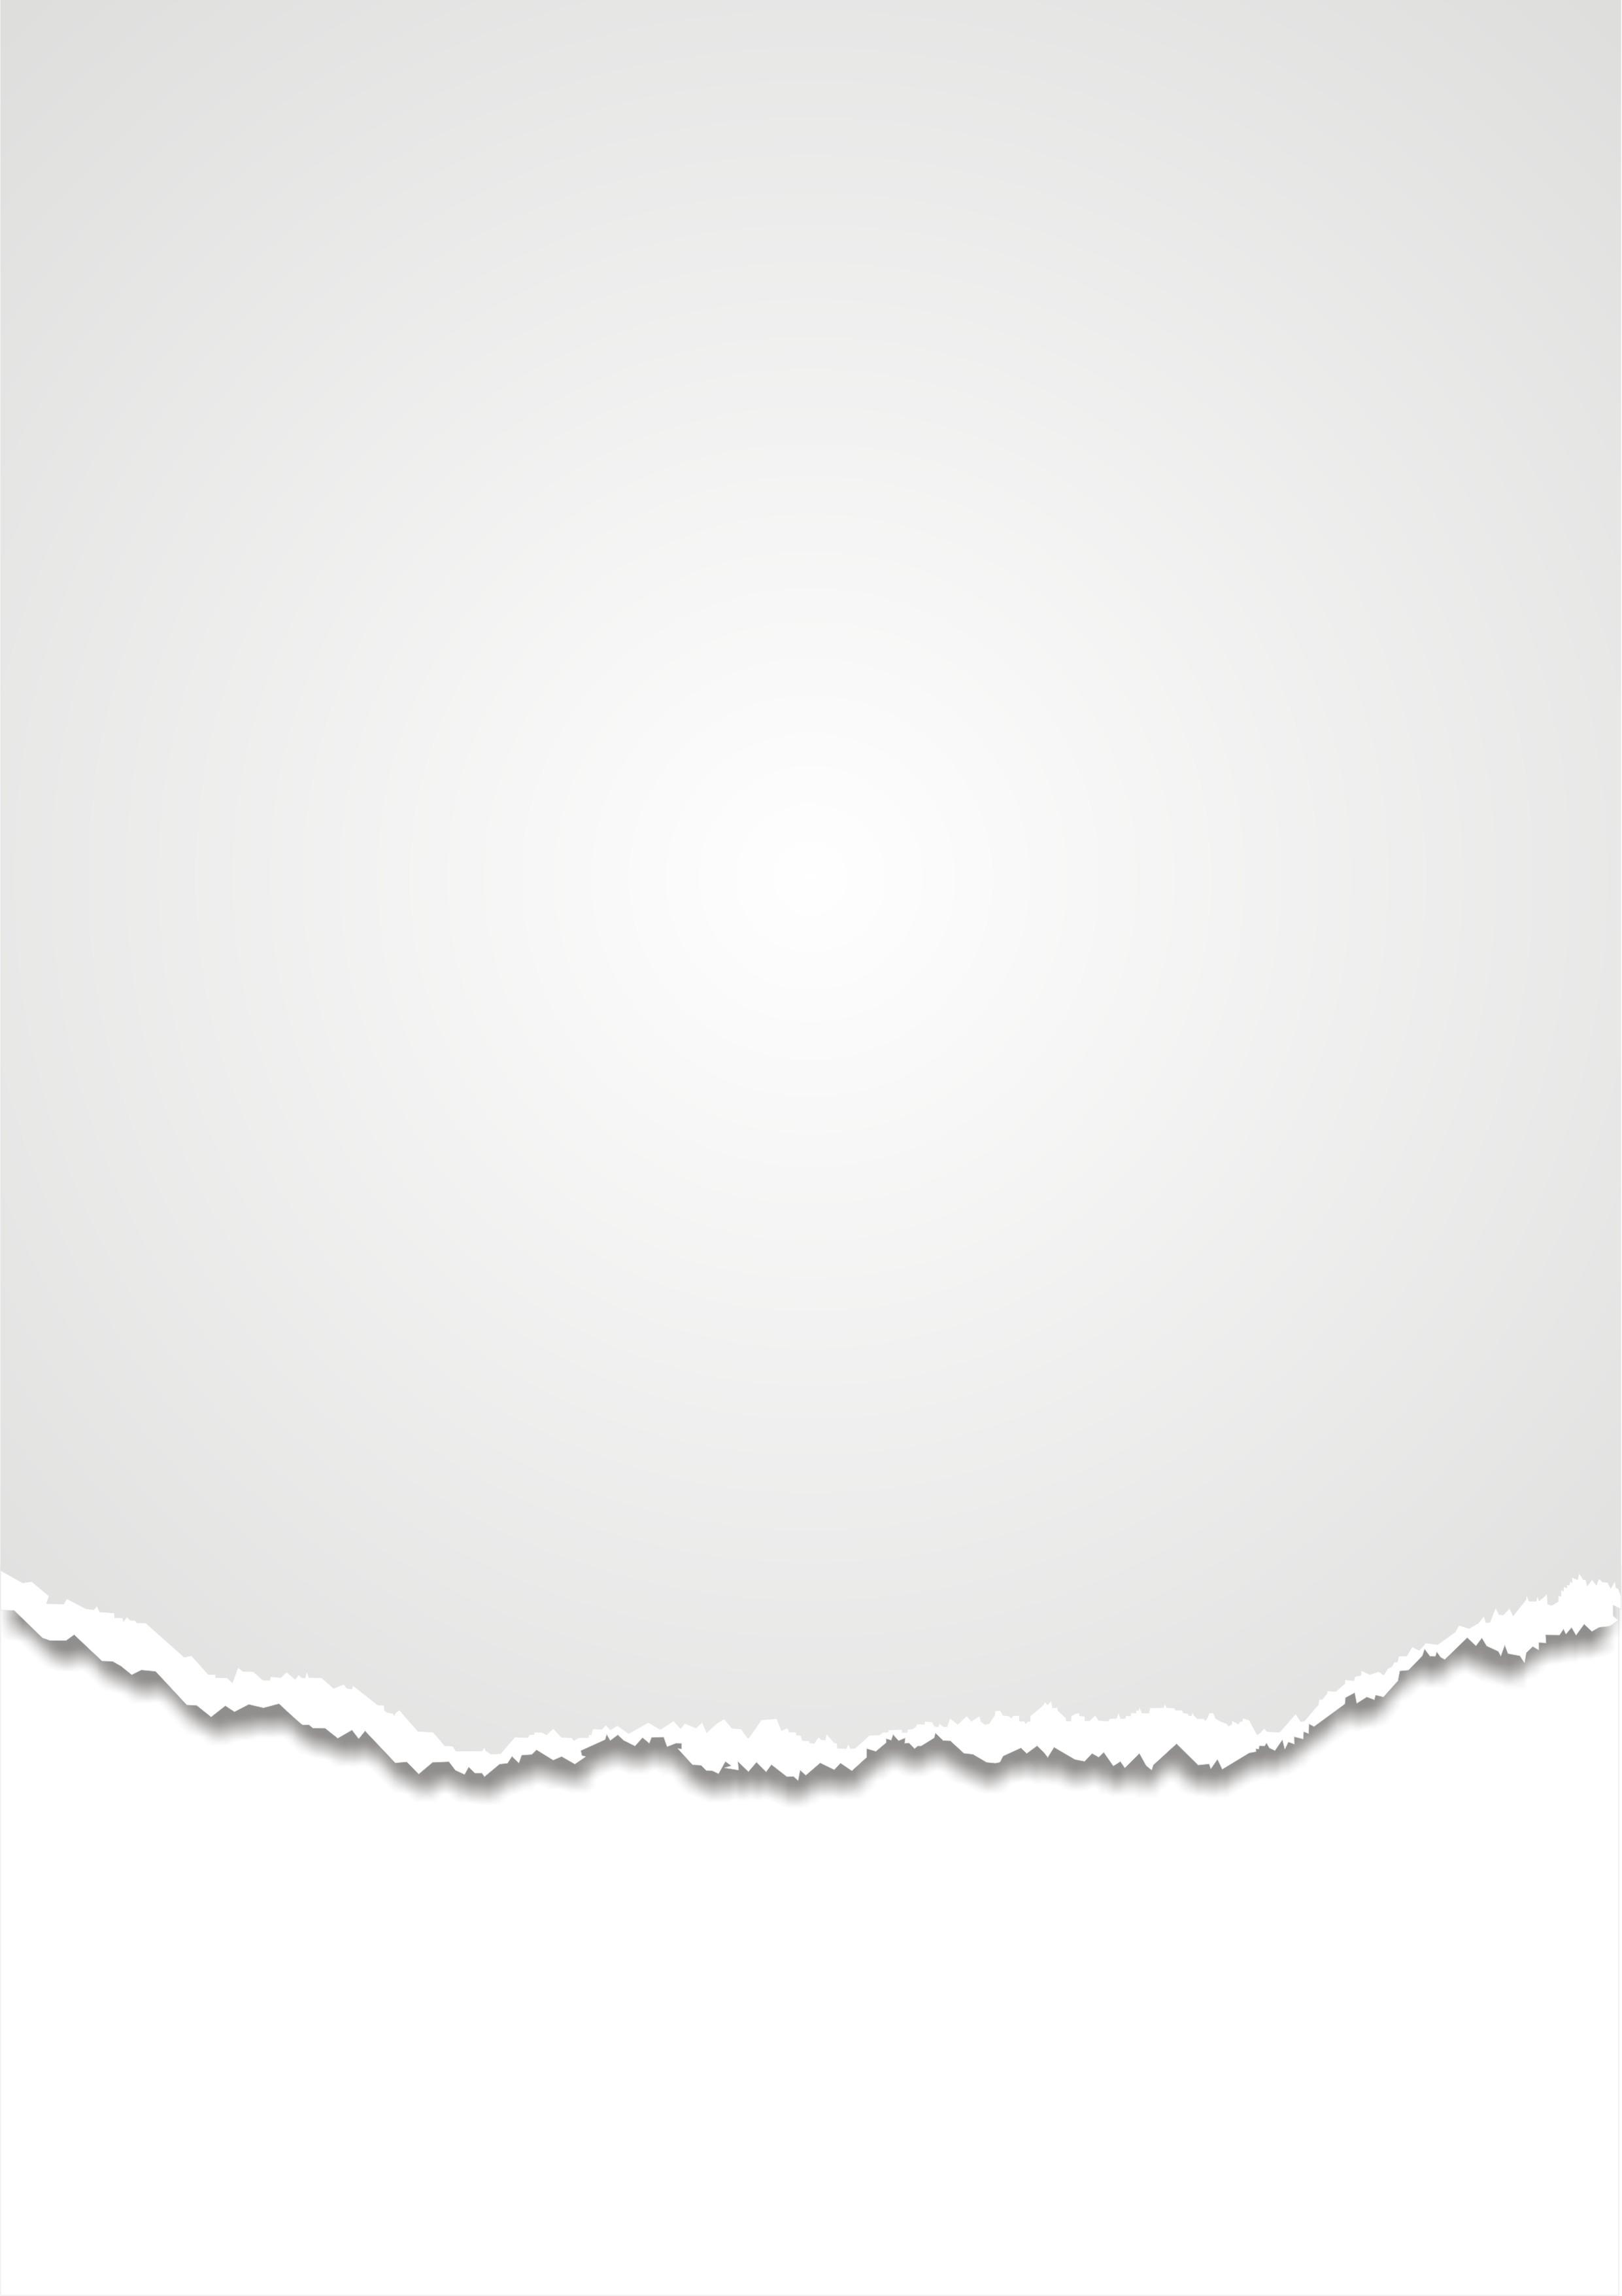 torn paper by markhal on deviantart torn paper vector illustrator torn paper vector image free